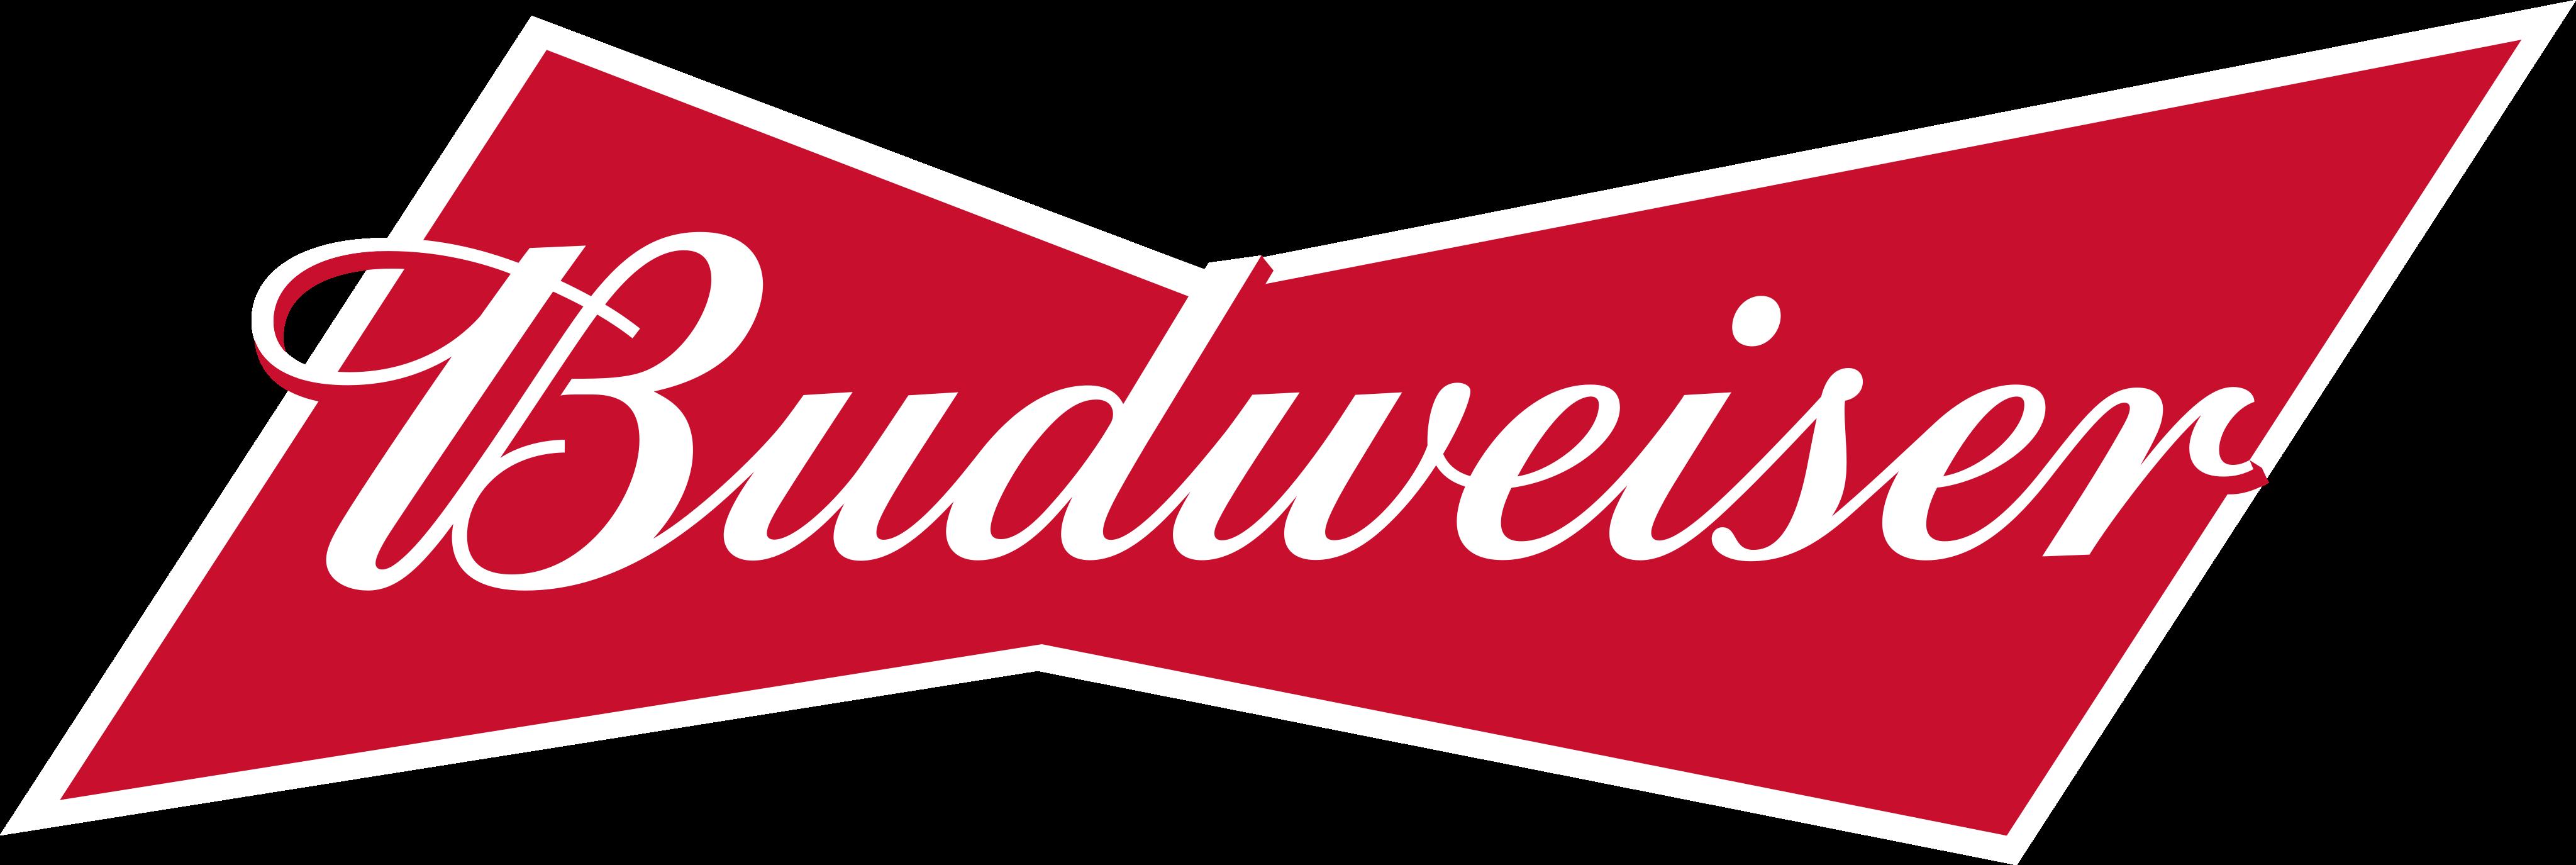 budweiser logo 8 - Budweiser Logo